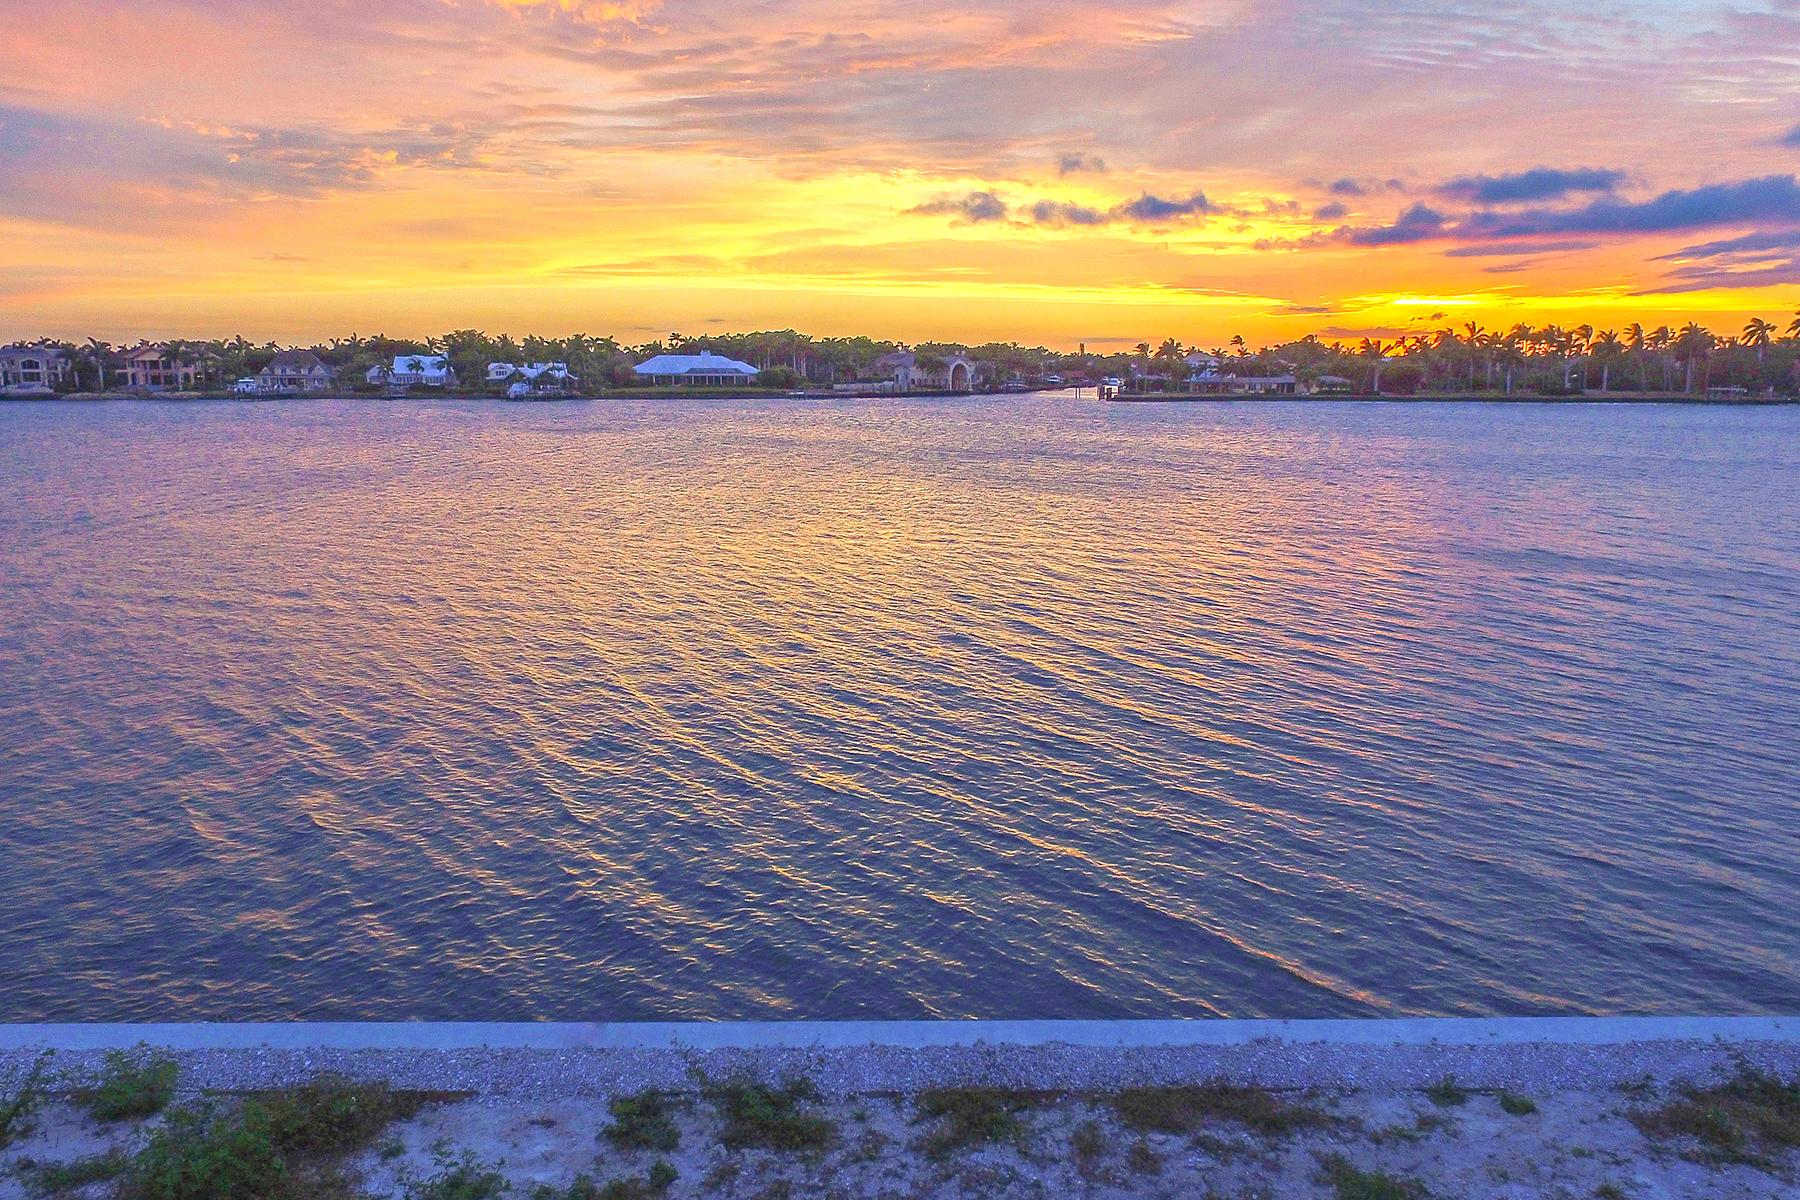 Terreno para Venda às ROYAL HARBOR 2280 Kingfish Rd Naples, Florida, 34102 Estados Unidos